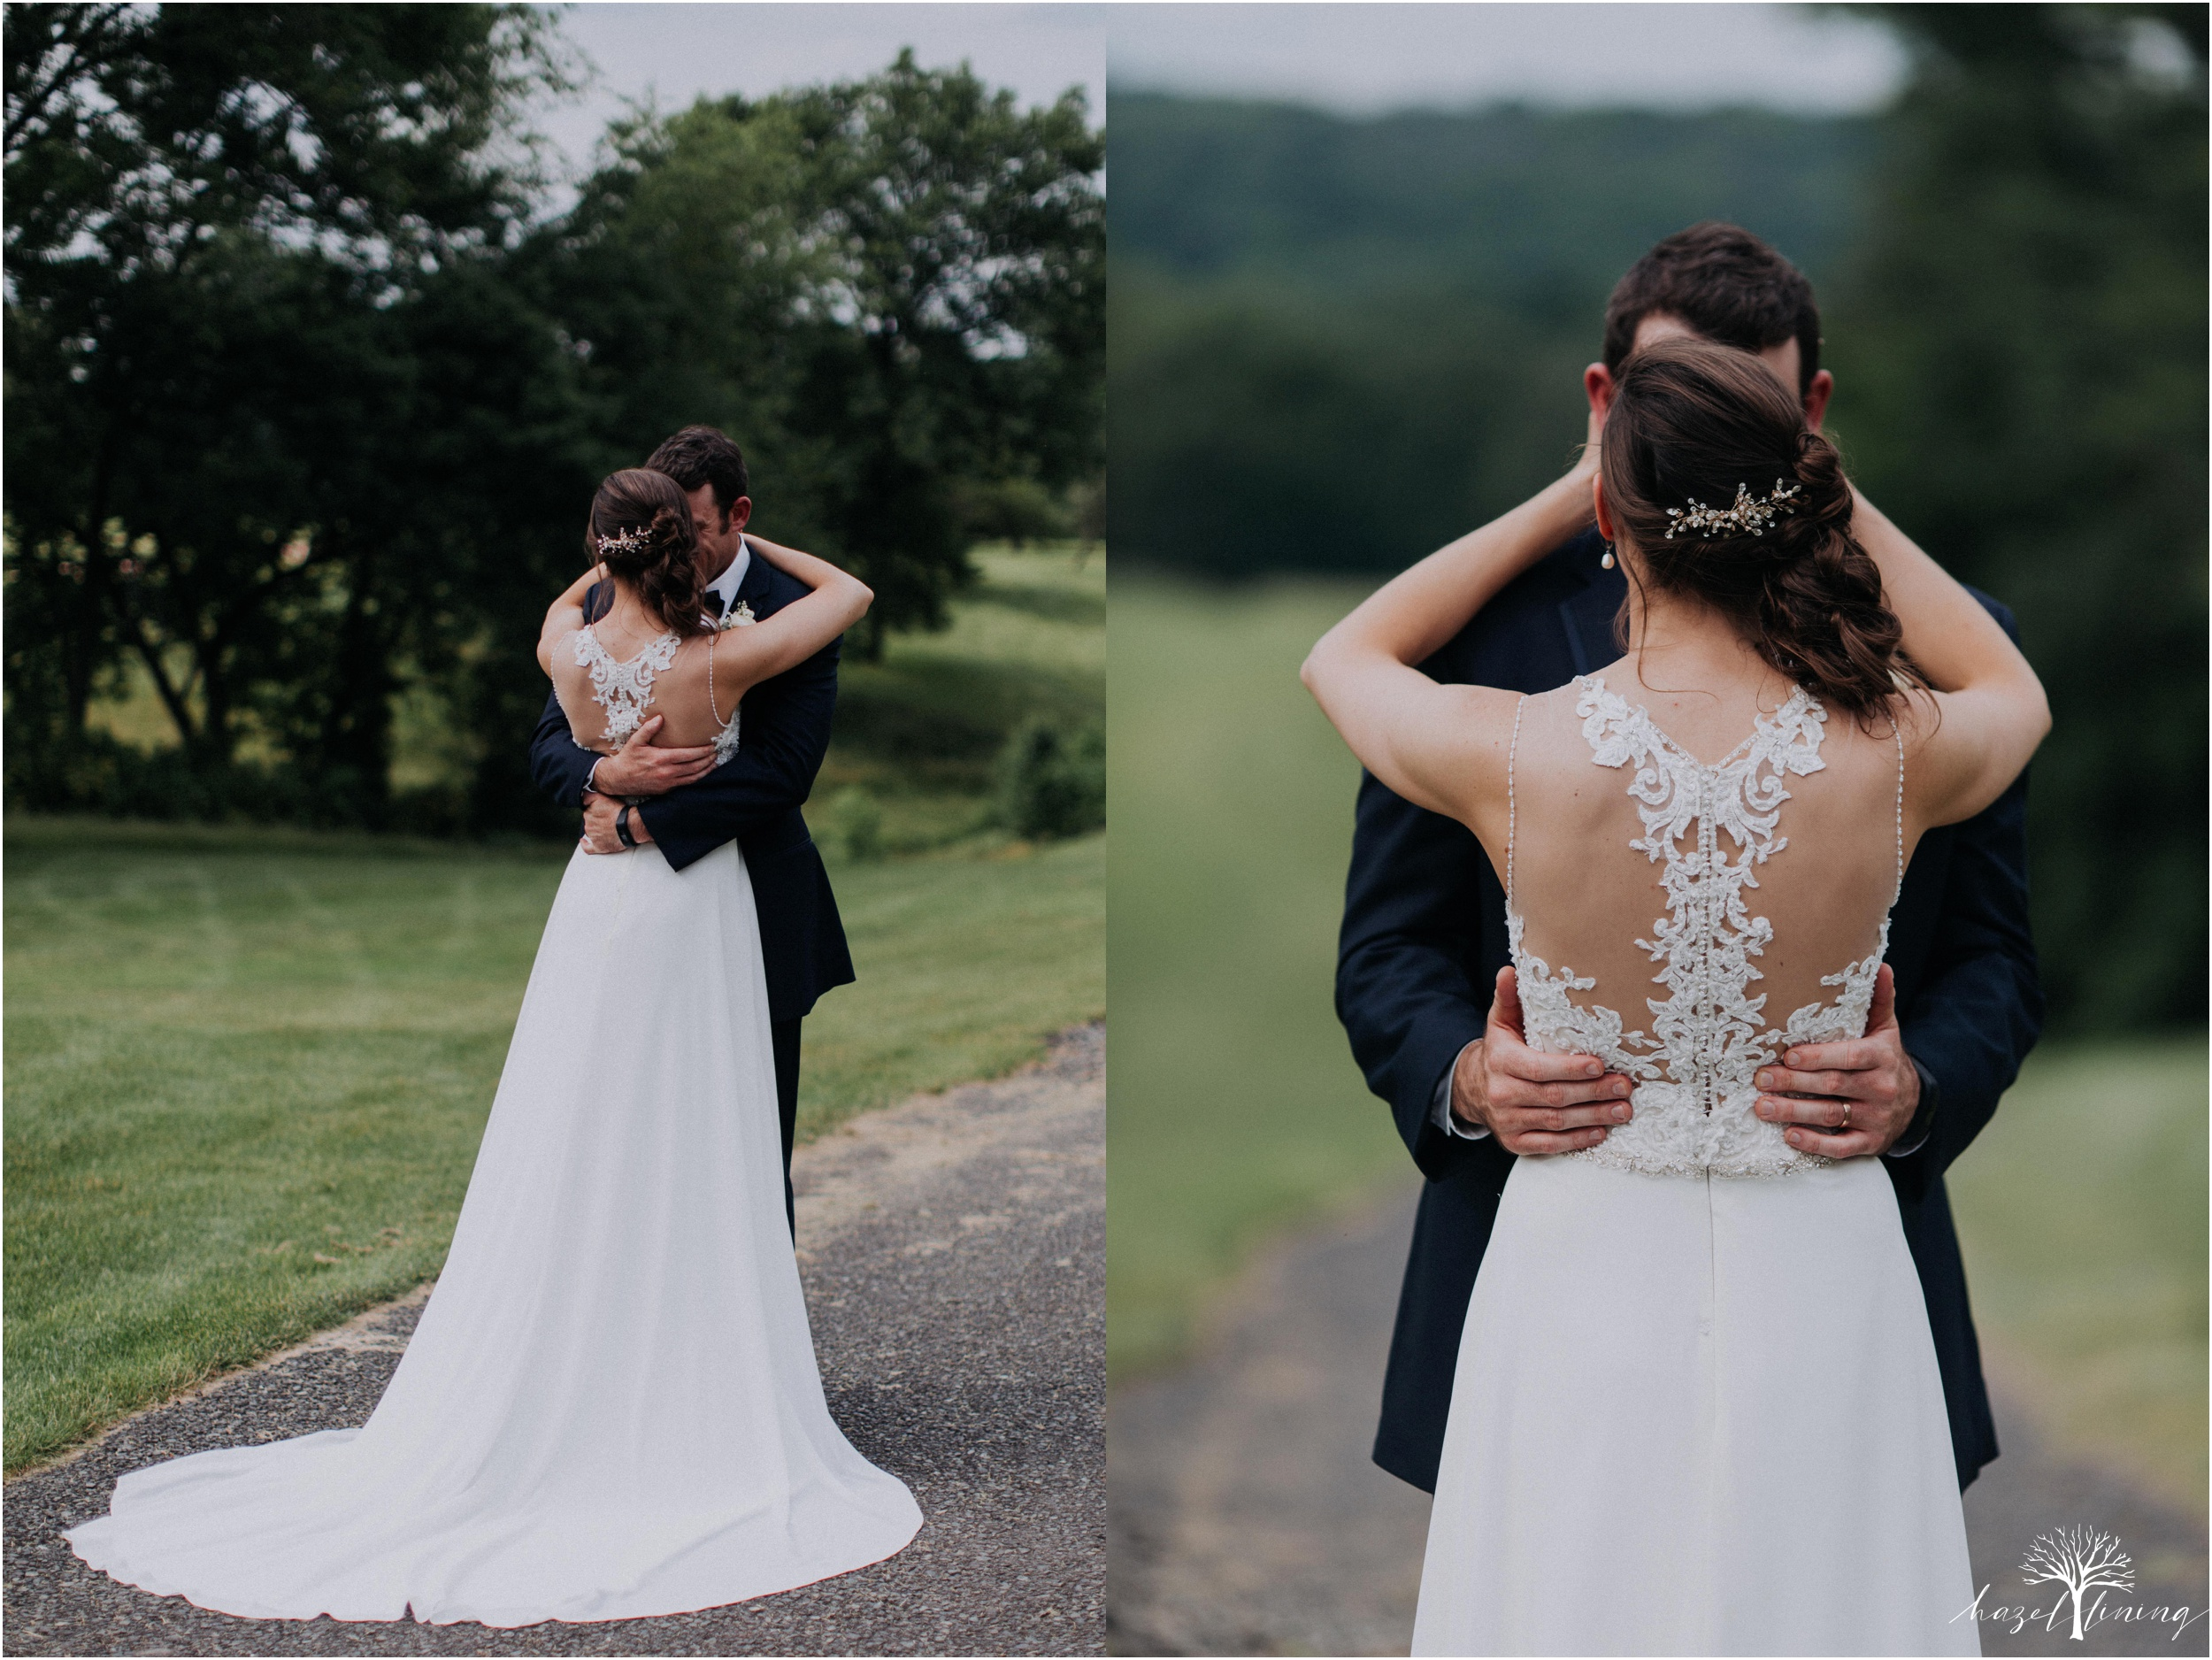 hazel-lining-travel-wedding-elopement-photography_0113.jpg